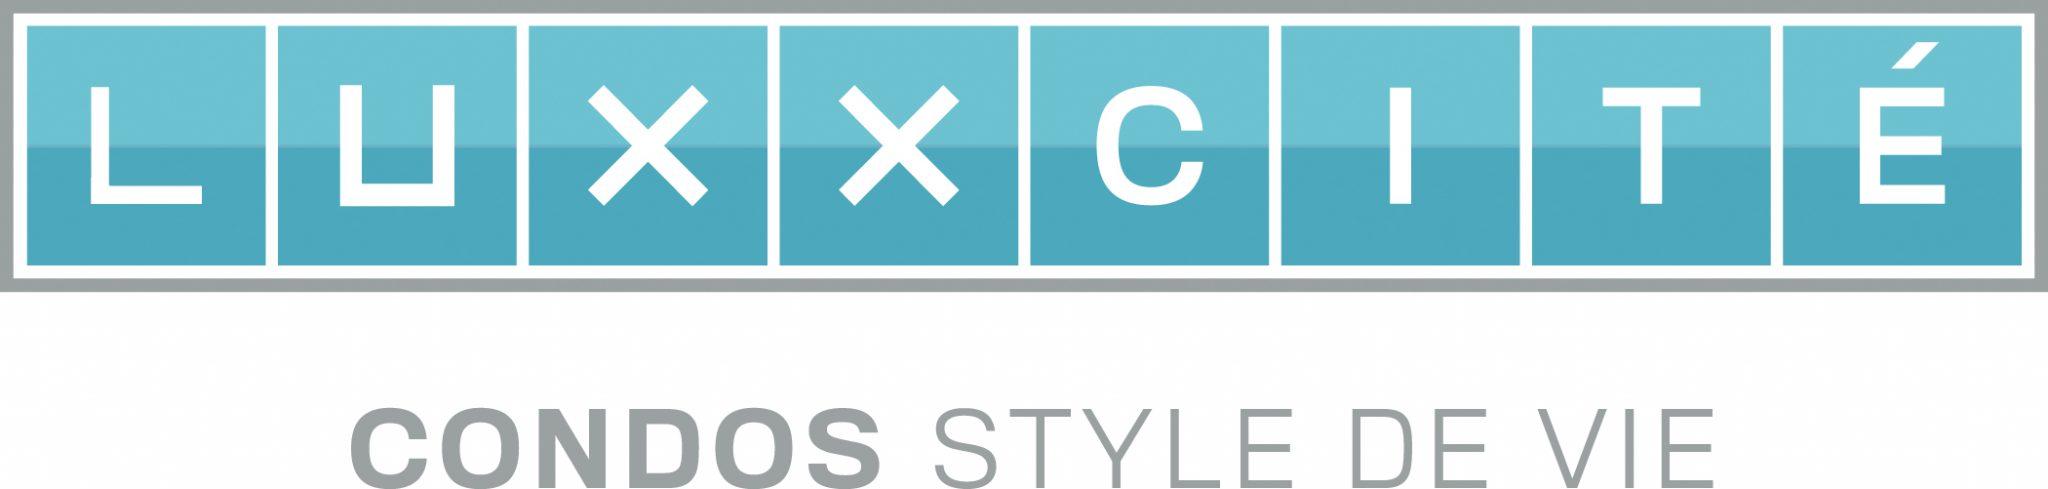 Luxxcite - Condos neufs a vendre a Mirabel